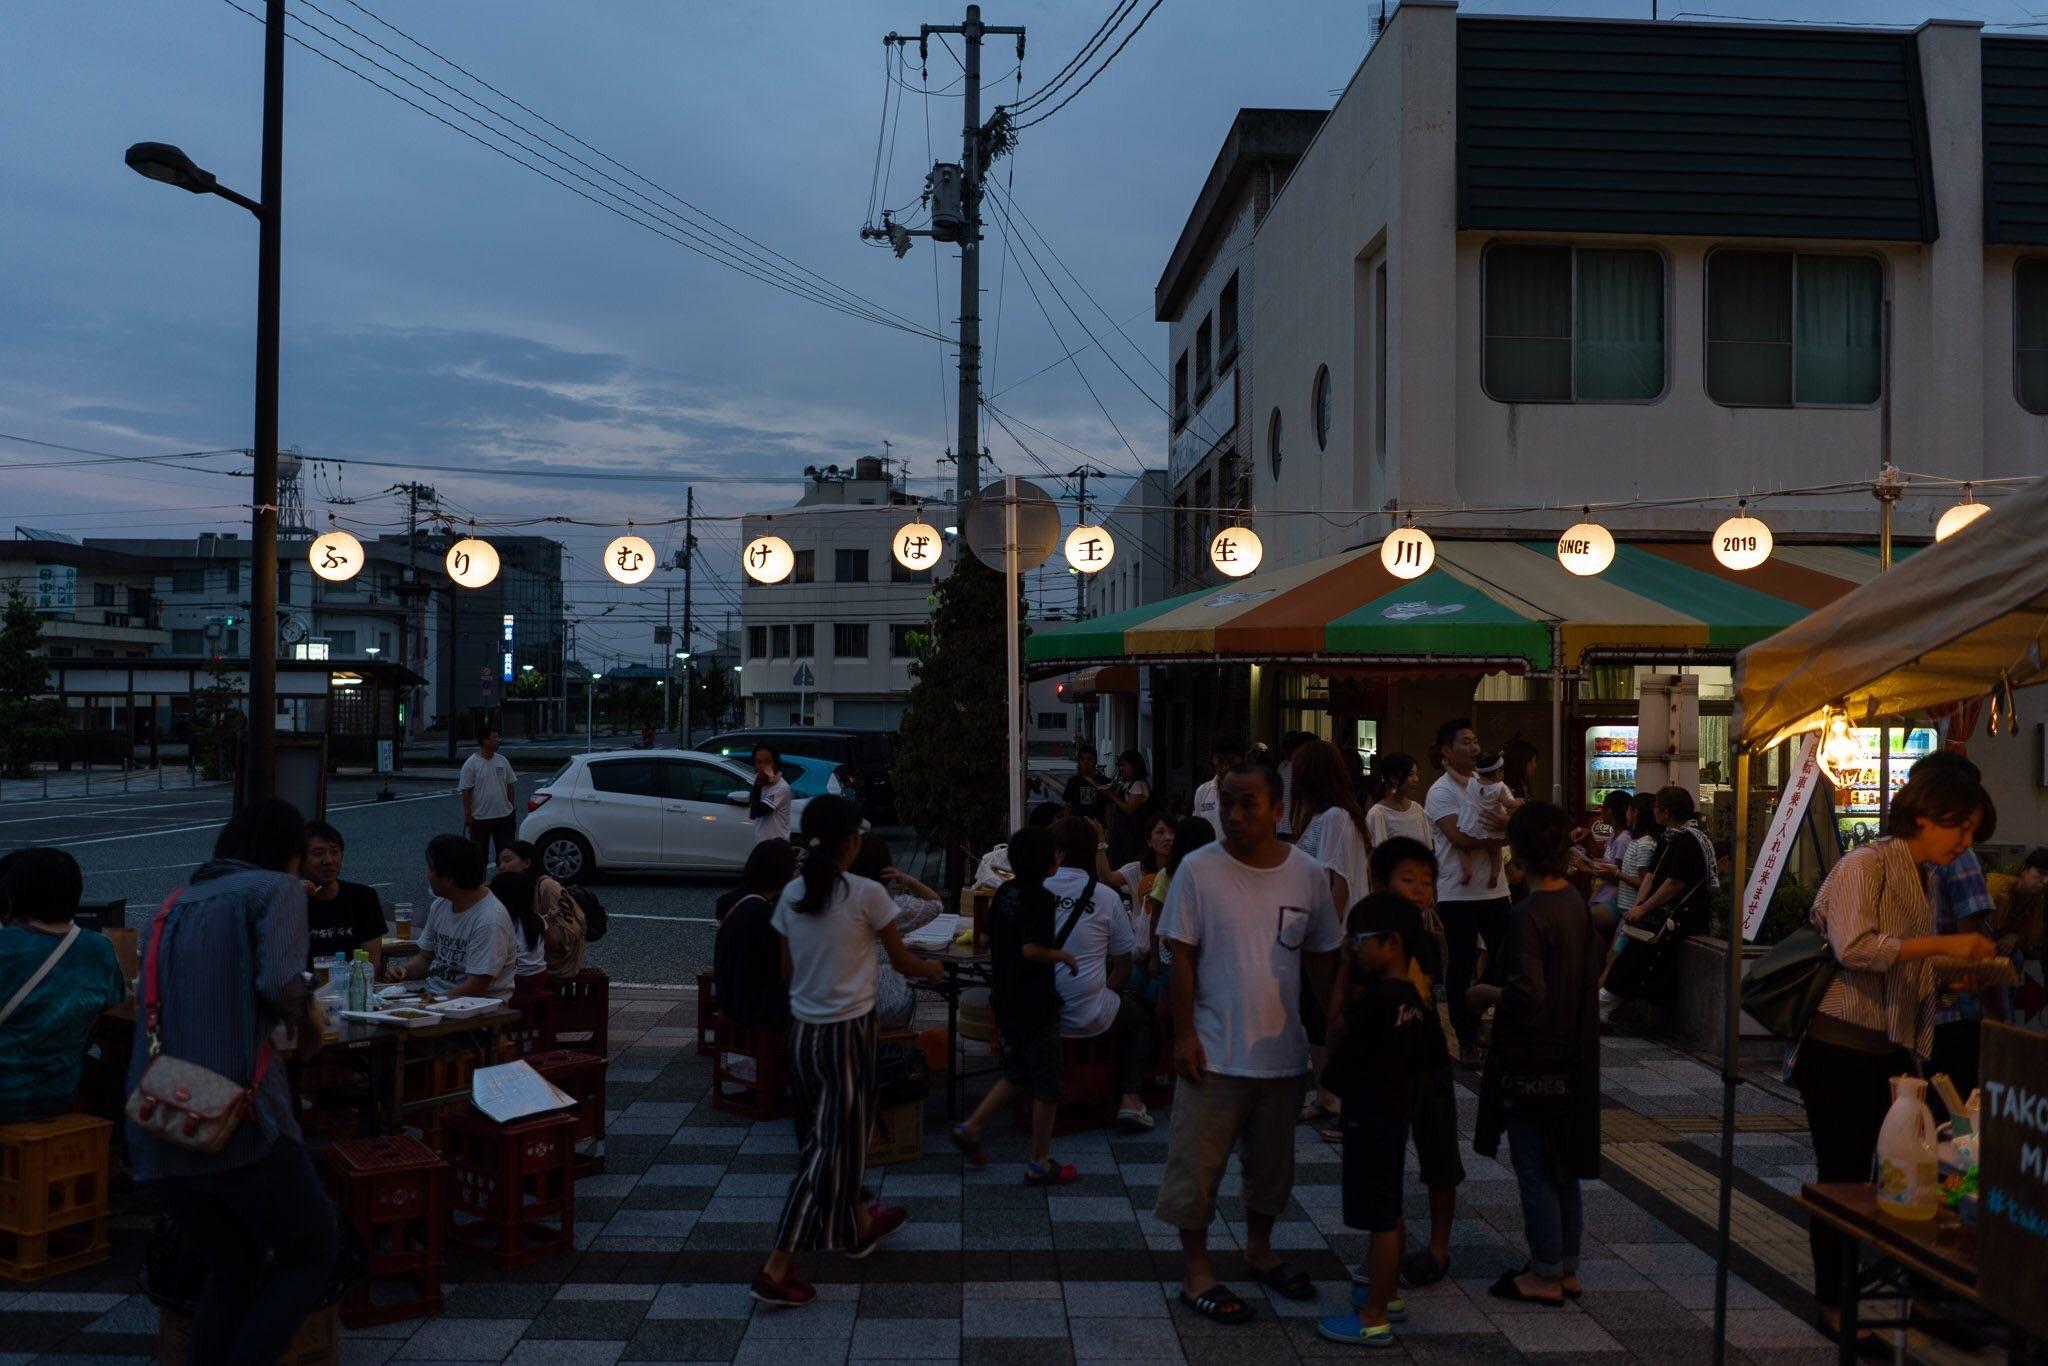 f:id:masanori-kato1972:20190826190946j:image